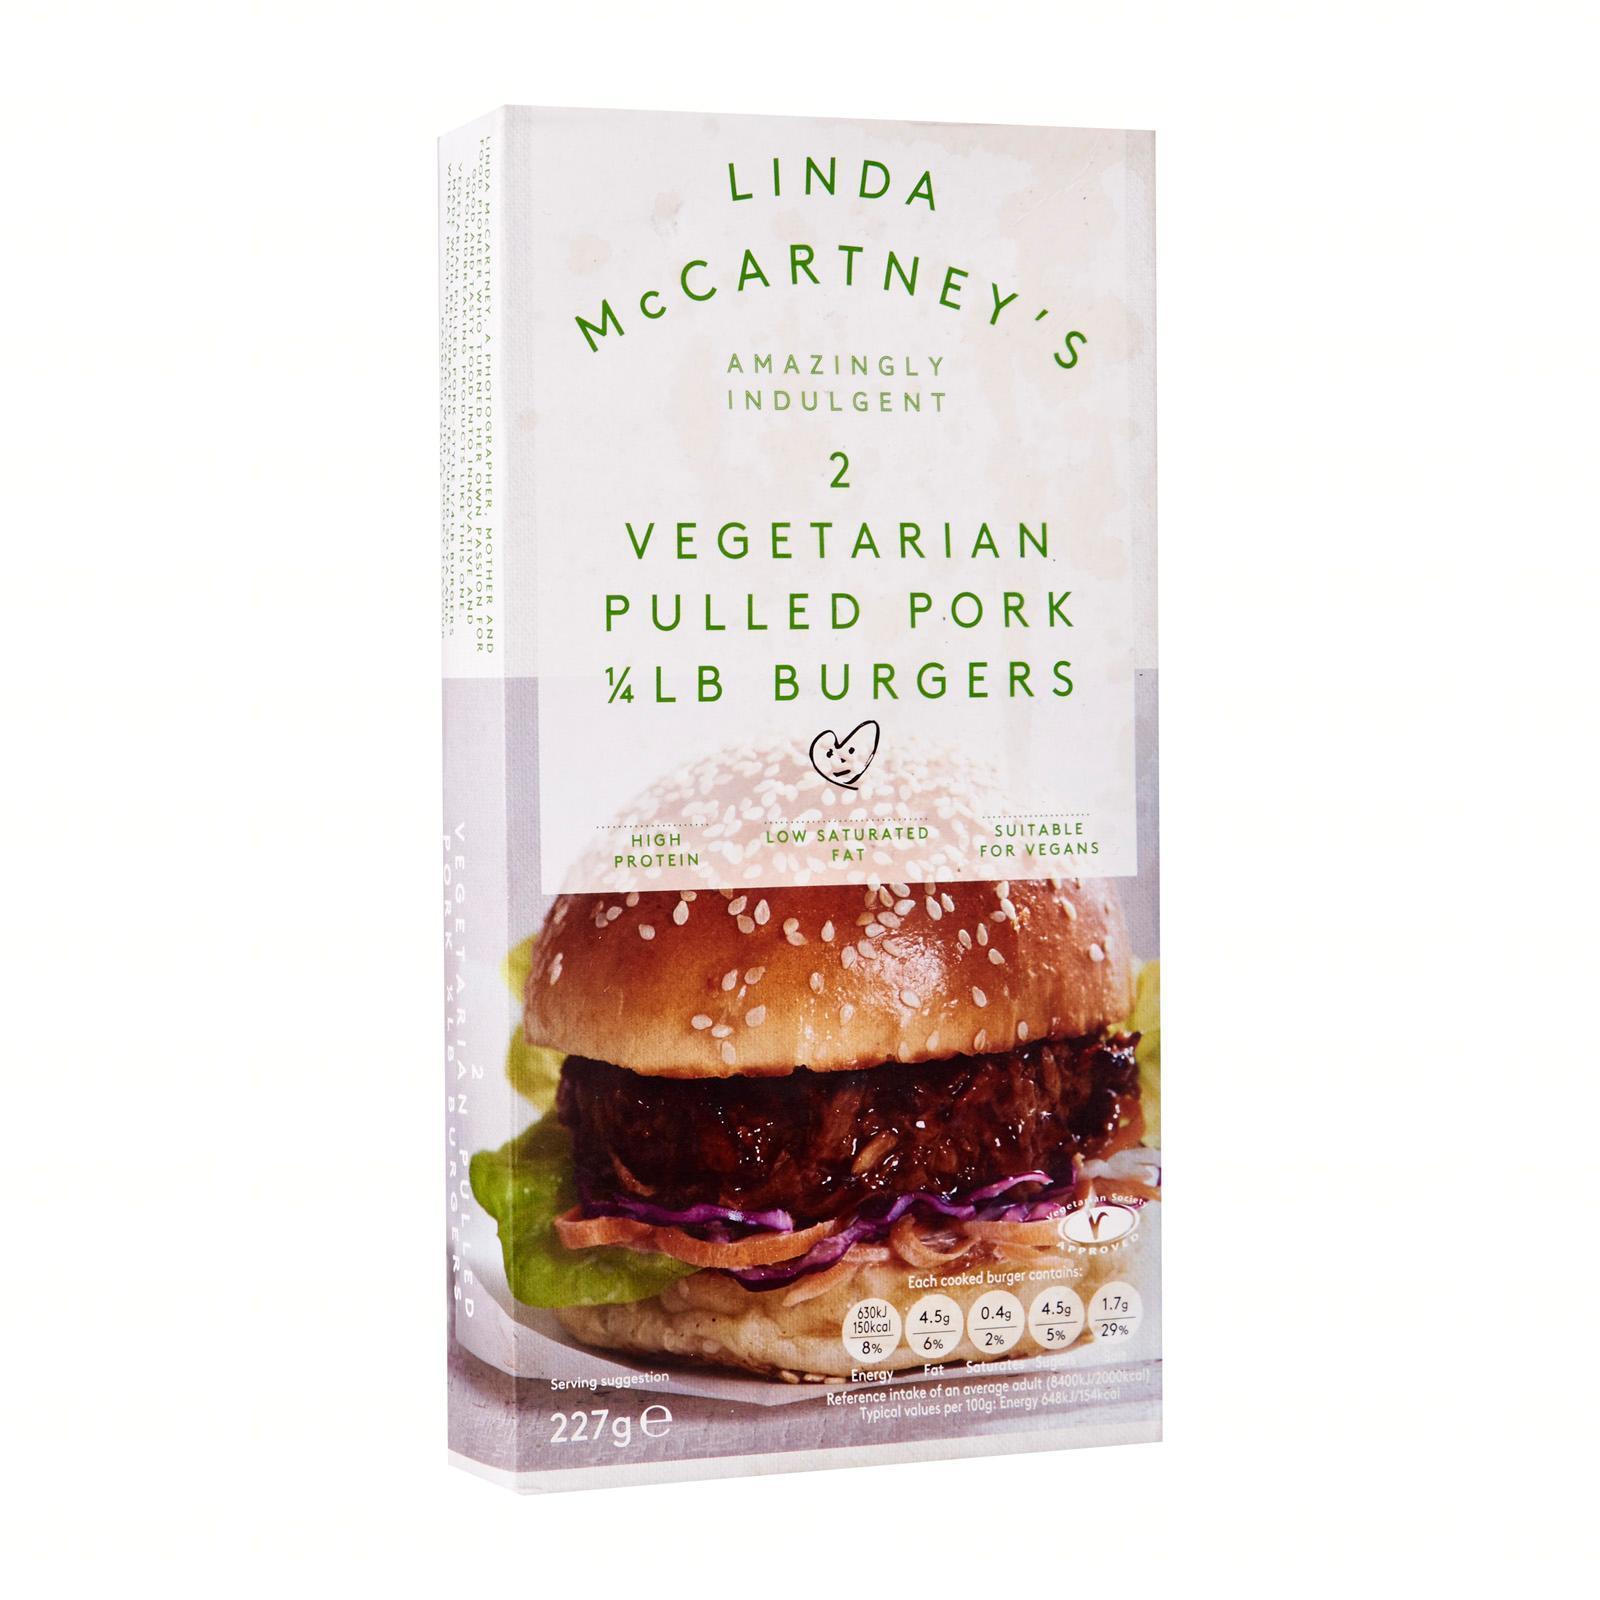 Linda McCartney's 2 Vegetarian Pulled Pork Burgers - Frozen